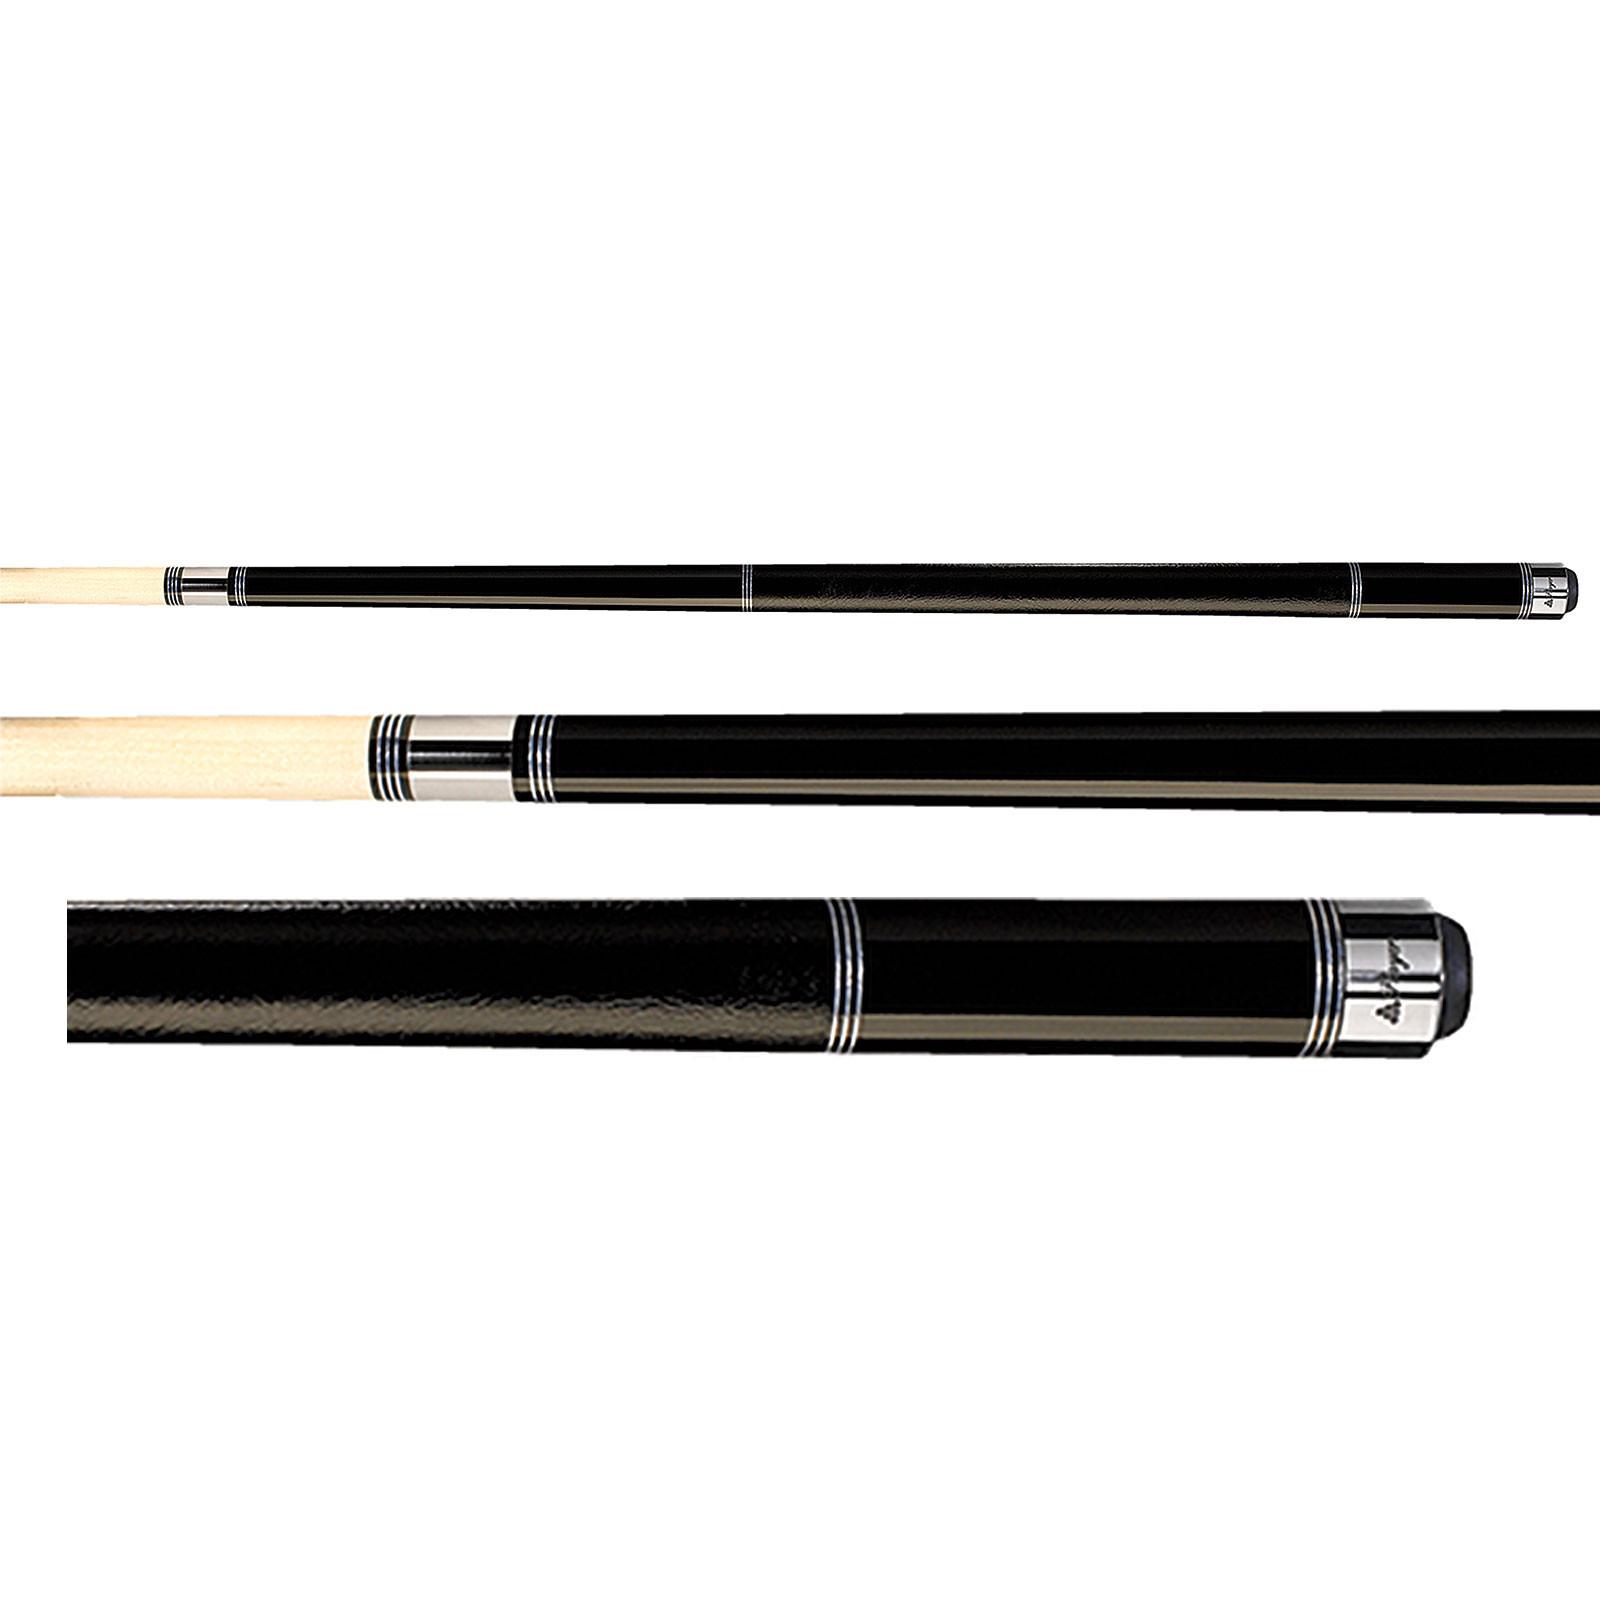 Players C-970 Midnight Black Pool Cue Stick